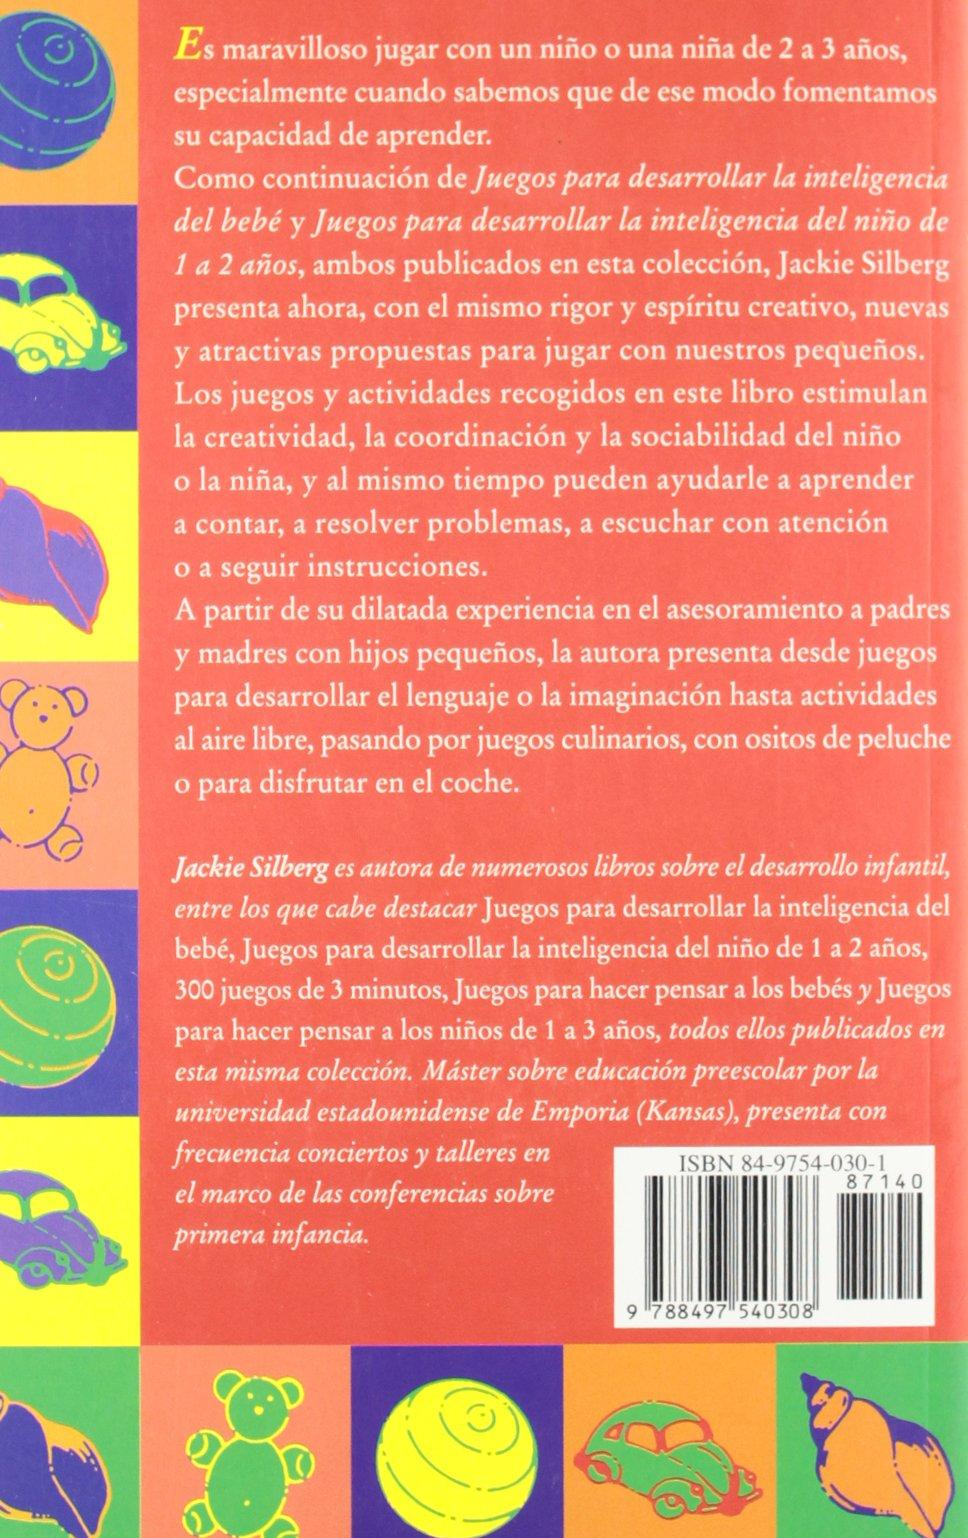 Juegos para desarrollar la inteligencia del nino de 2 a 3 anos / Games to Develop The intelligence of The Child From 2-3 Years (Spanish Edition): Jackie ...